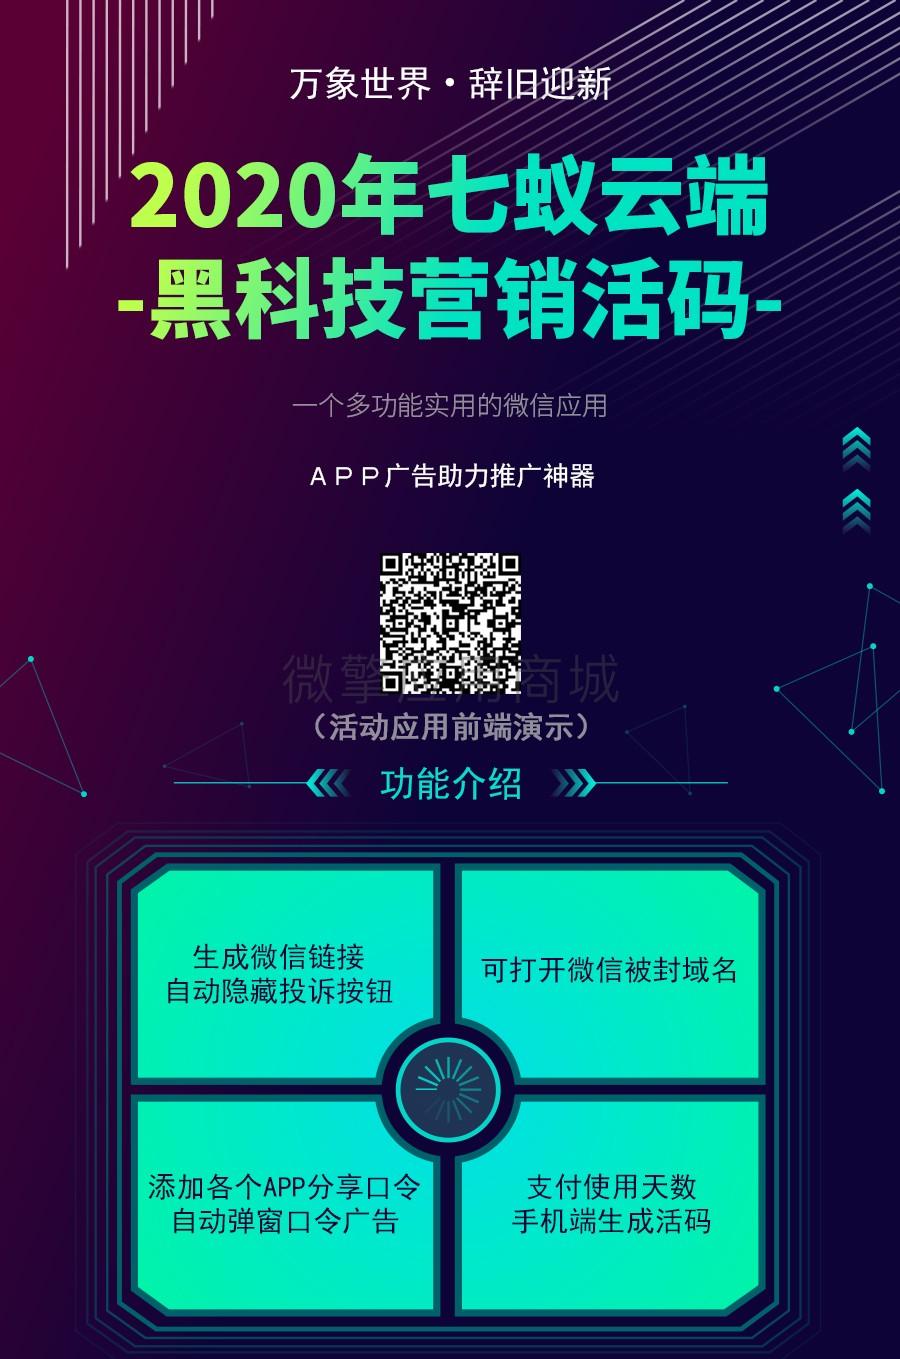 wq模块防封黑科技广告活码v1.1.3+基础模块1.1.8-渔枫源码分享网